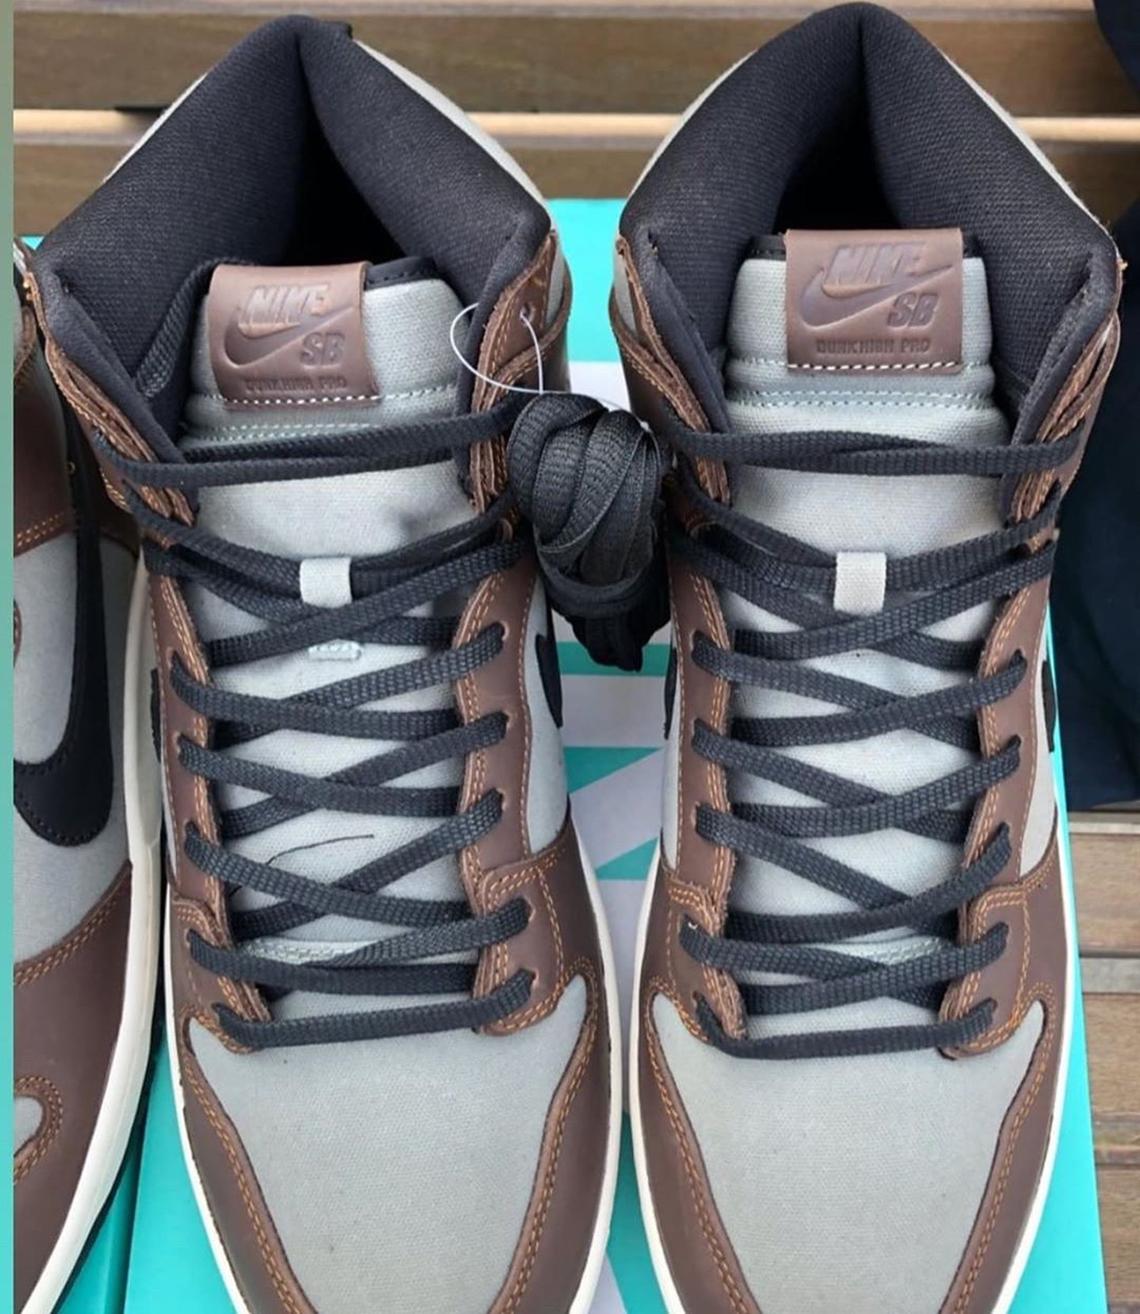 Nike SB Dunk High Baroque Brown Release